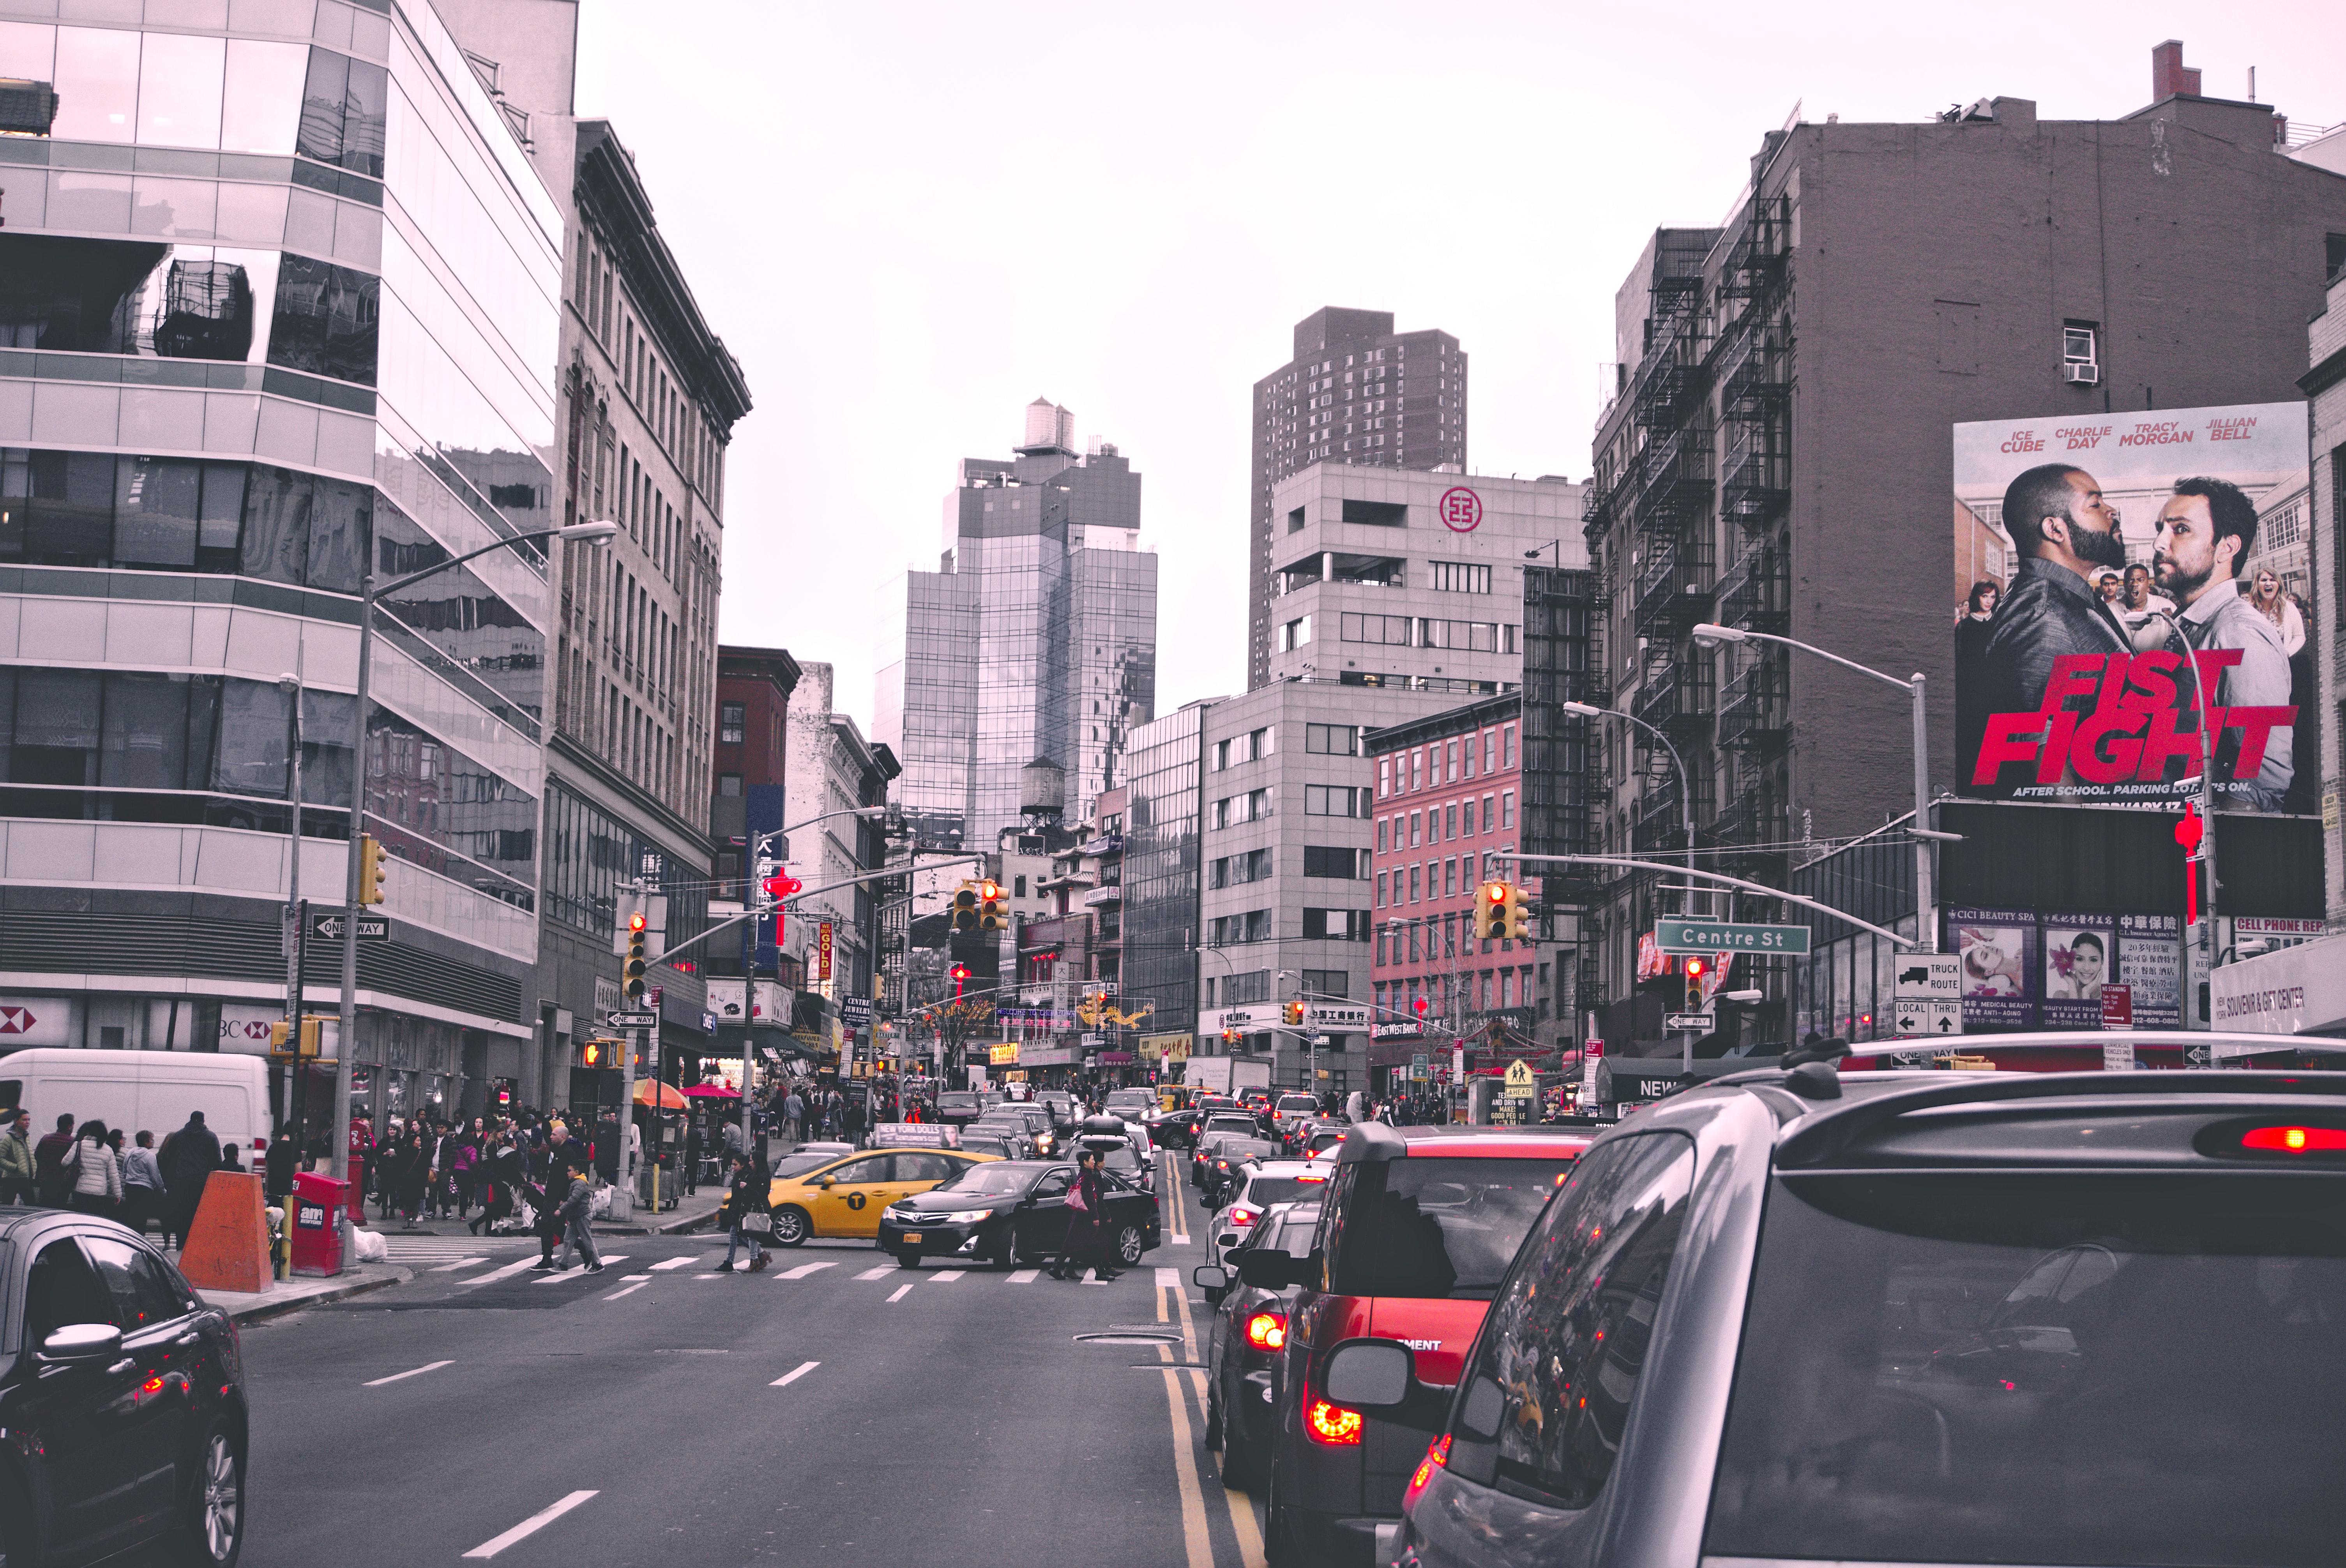 Traffic on City Street, Outdoors, Vehicles, Urban area, Urban, HQ Photo